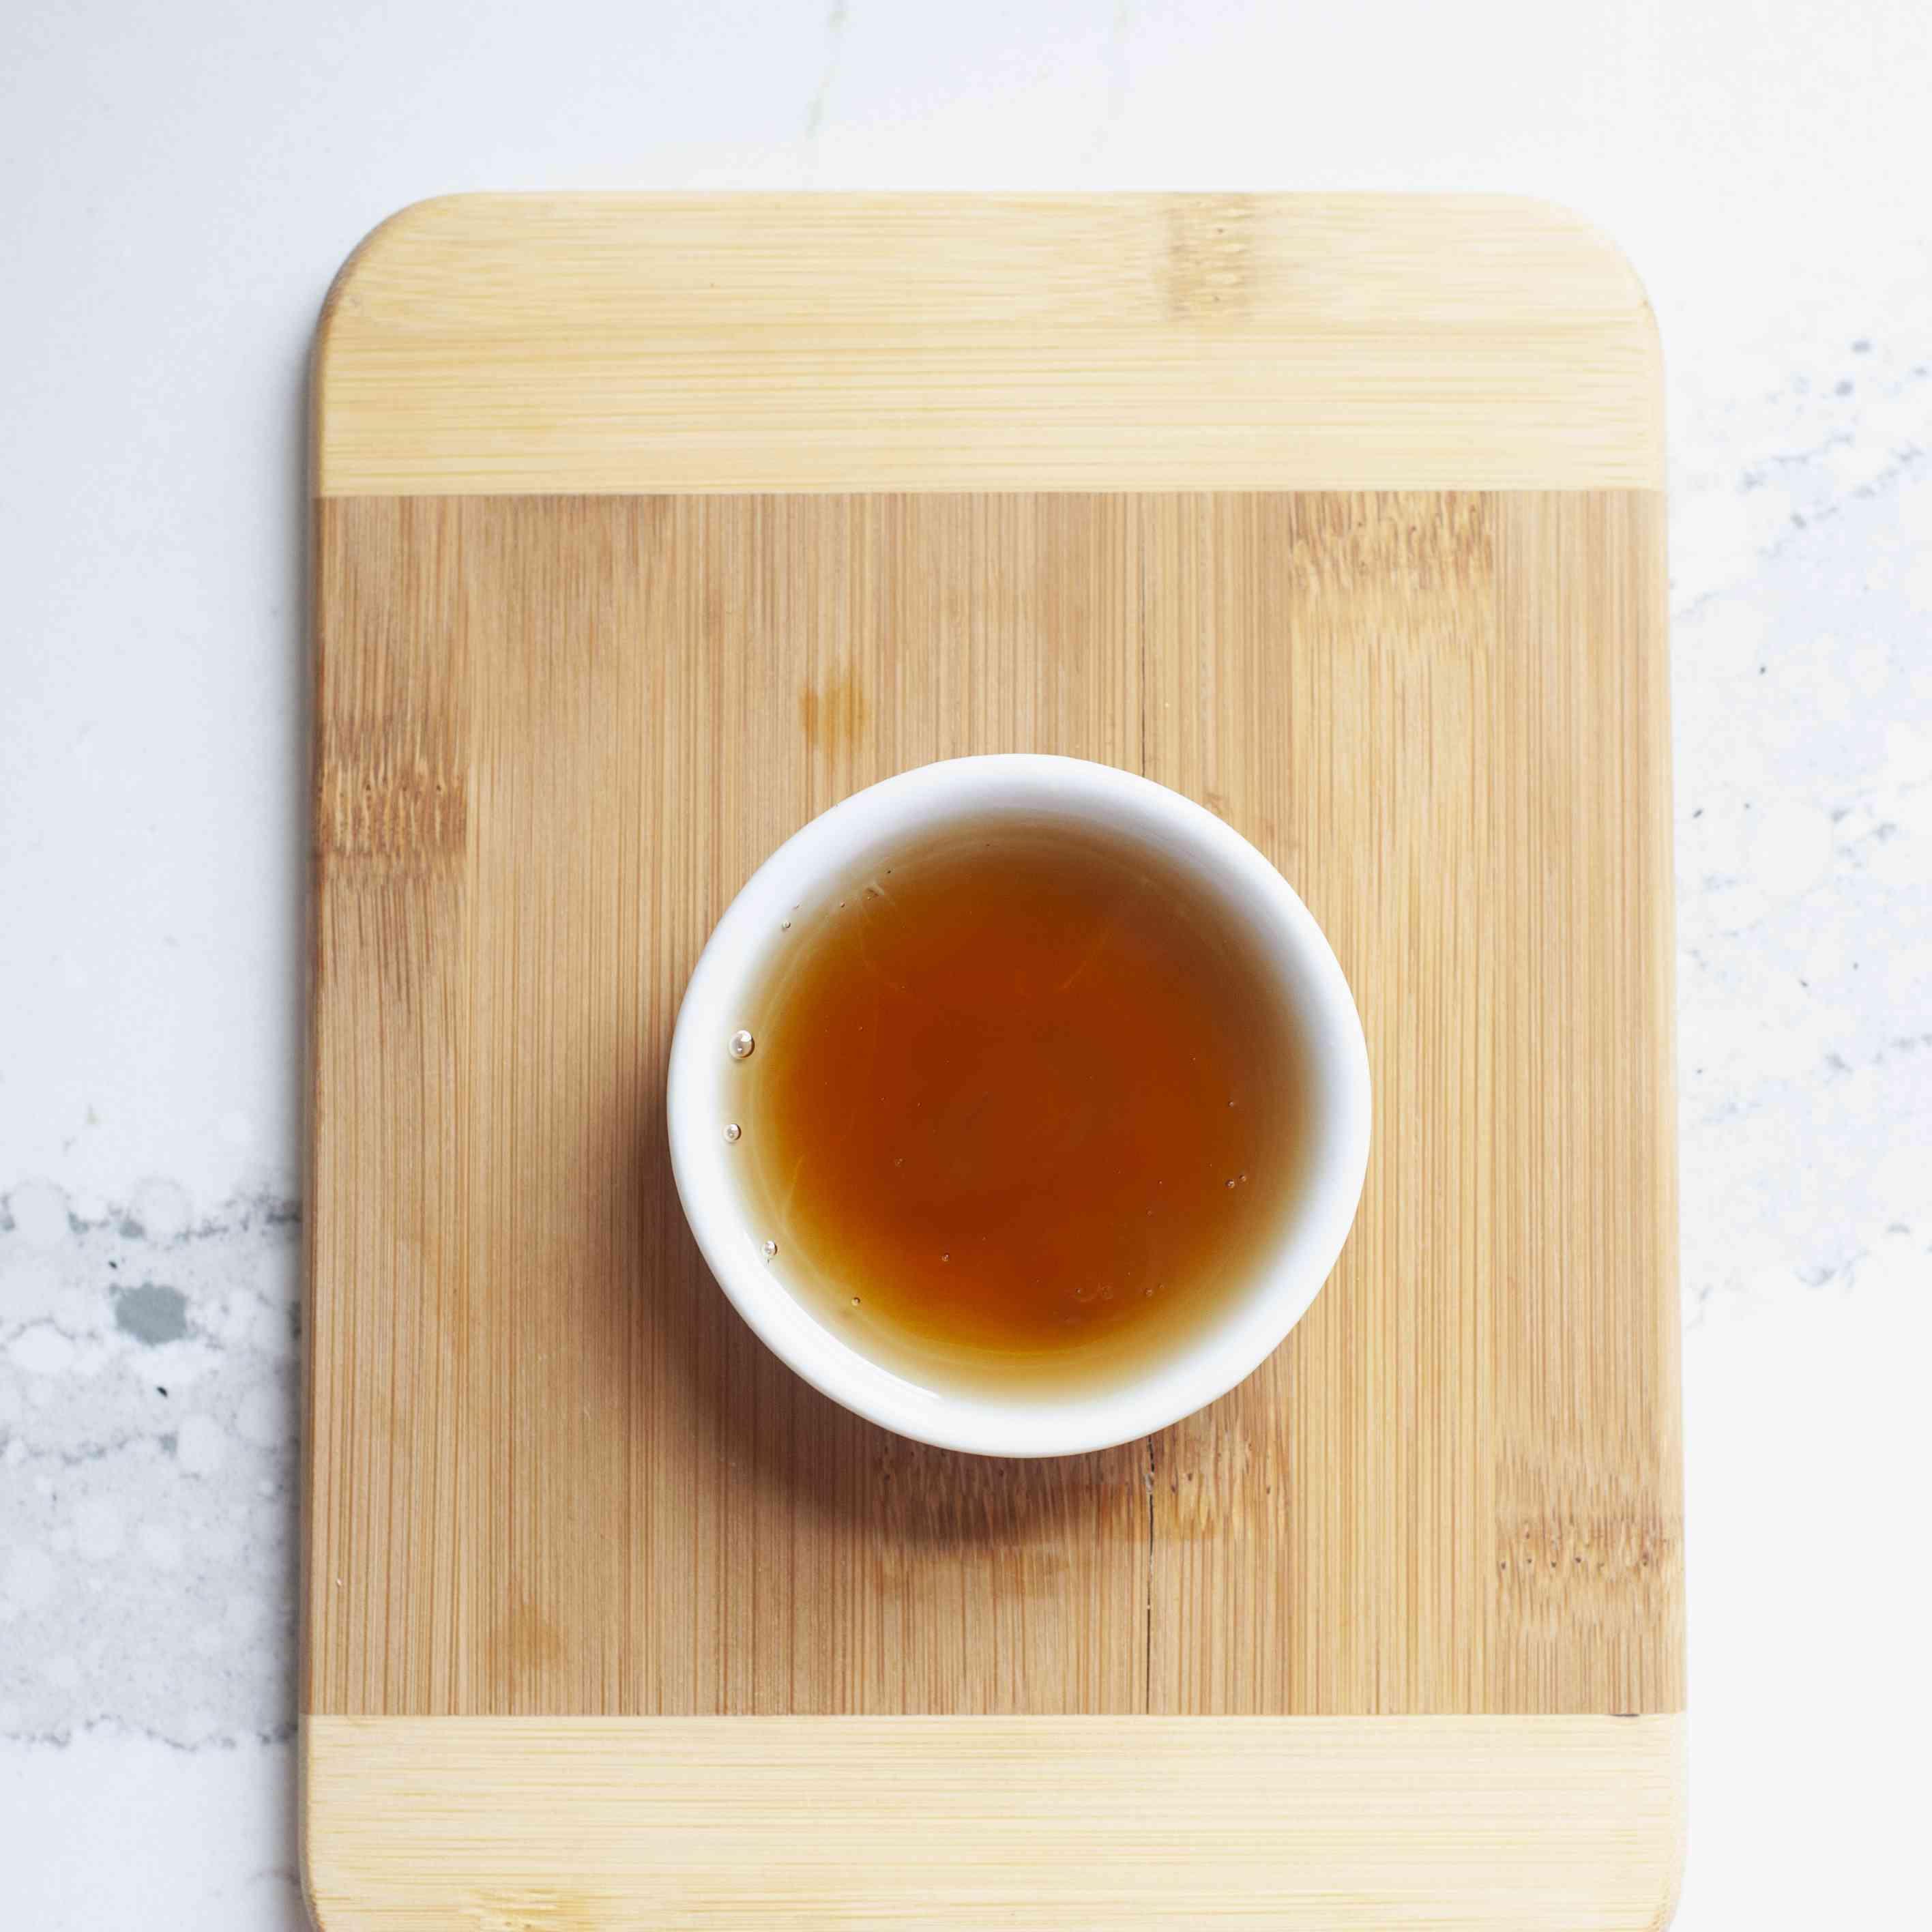 Toasted sesame oil in white bowl